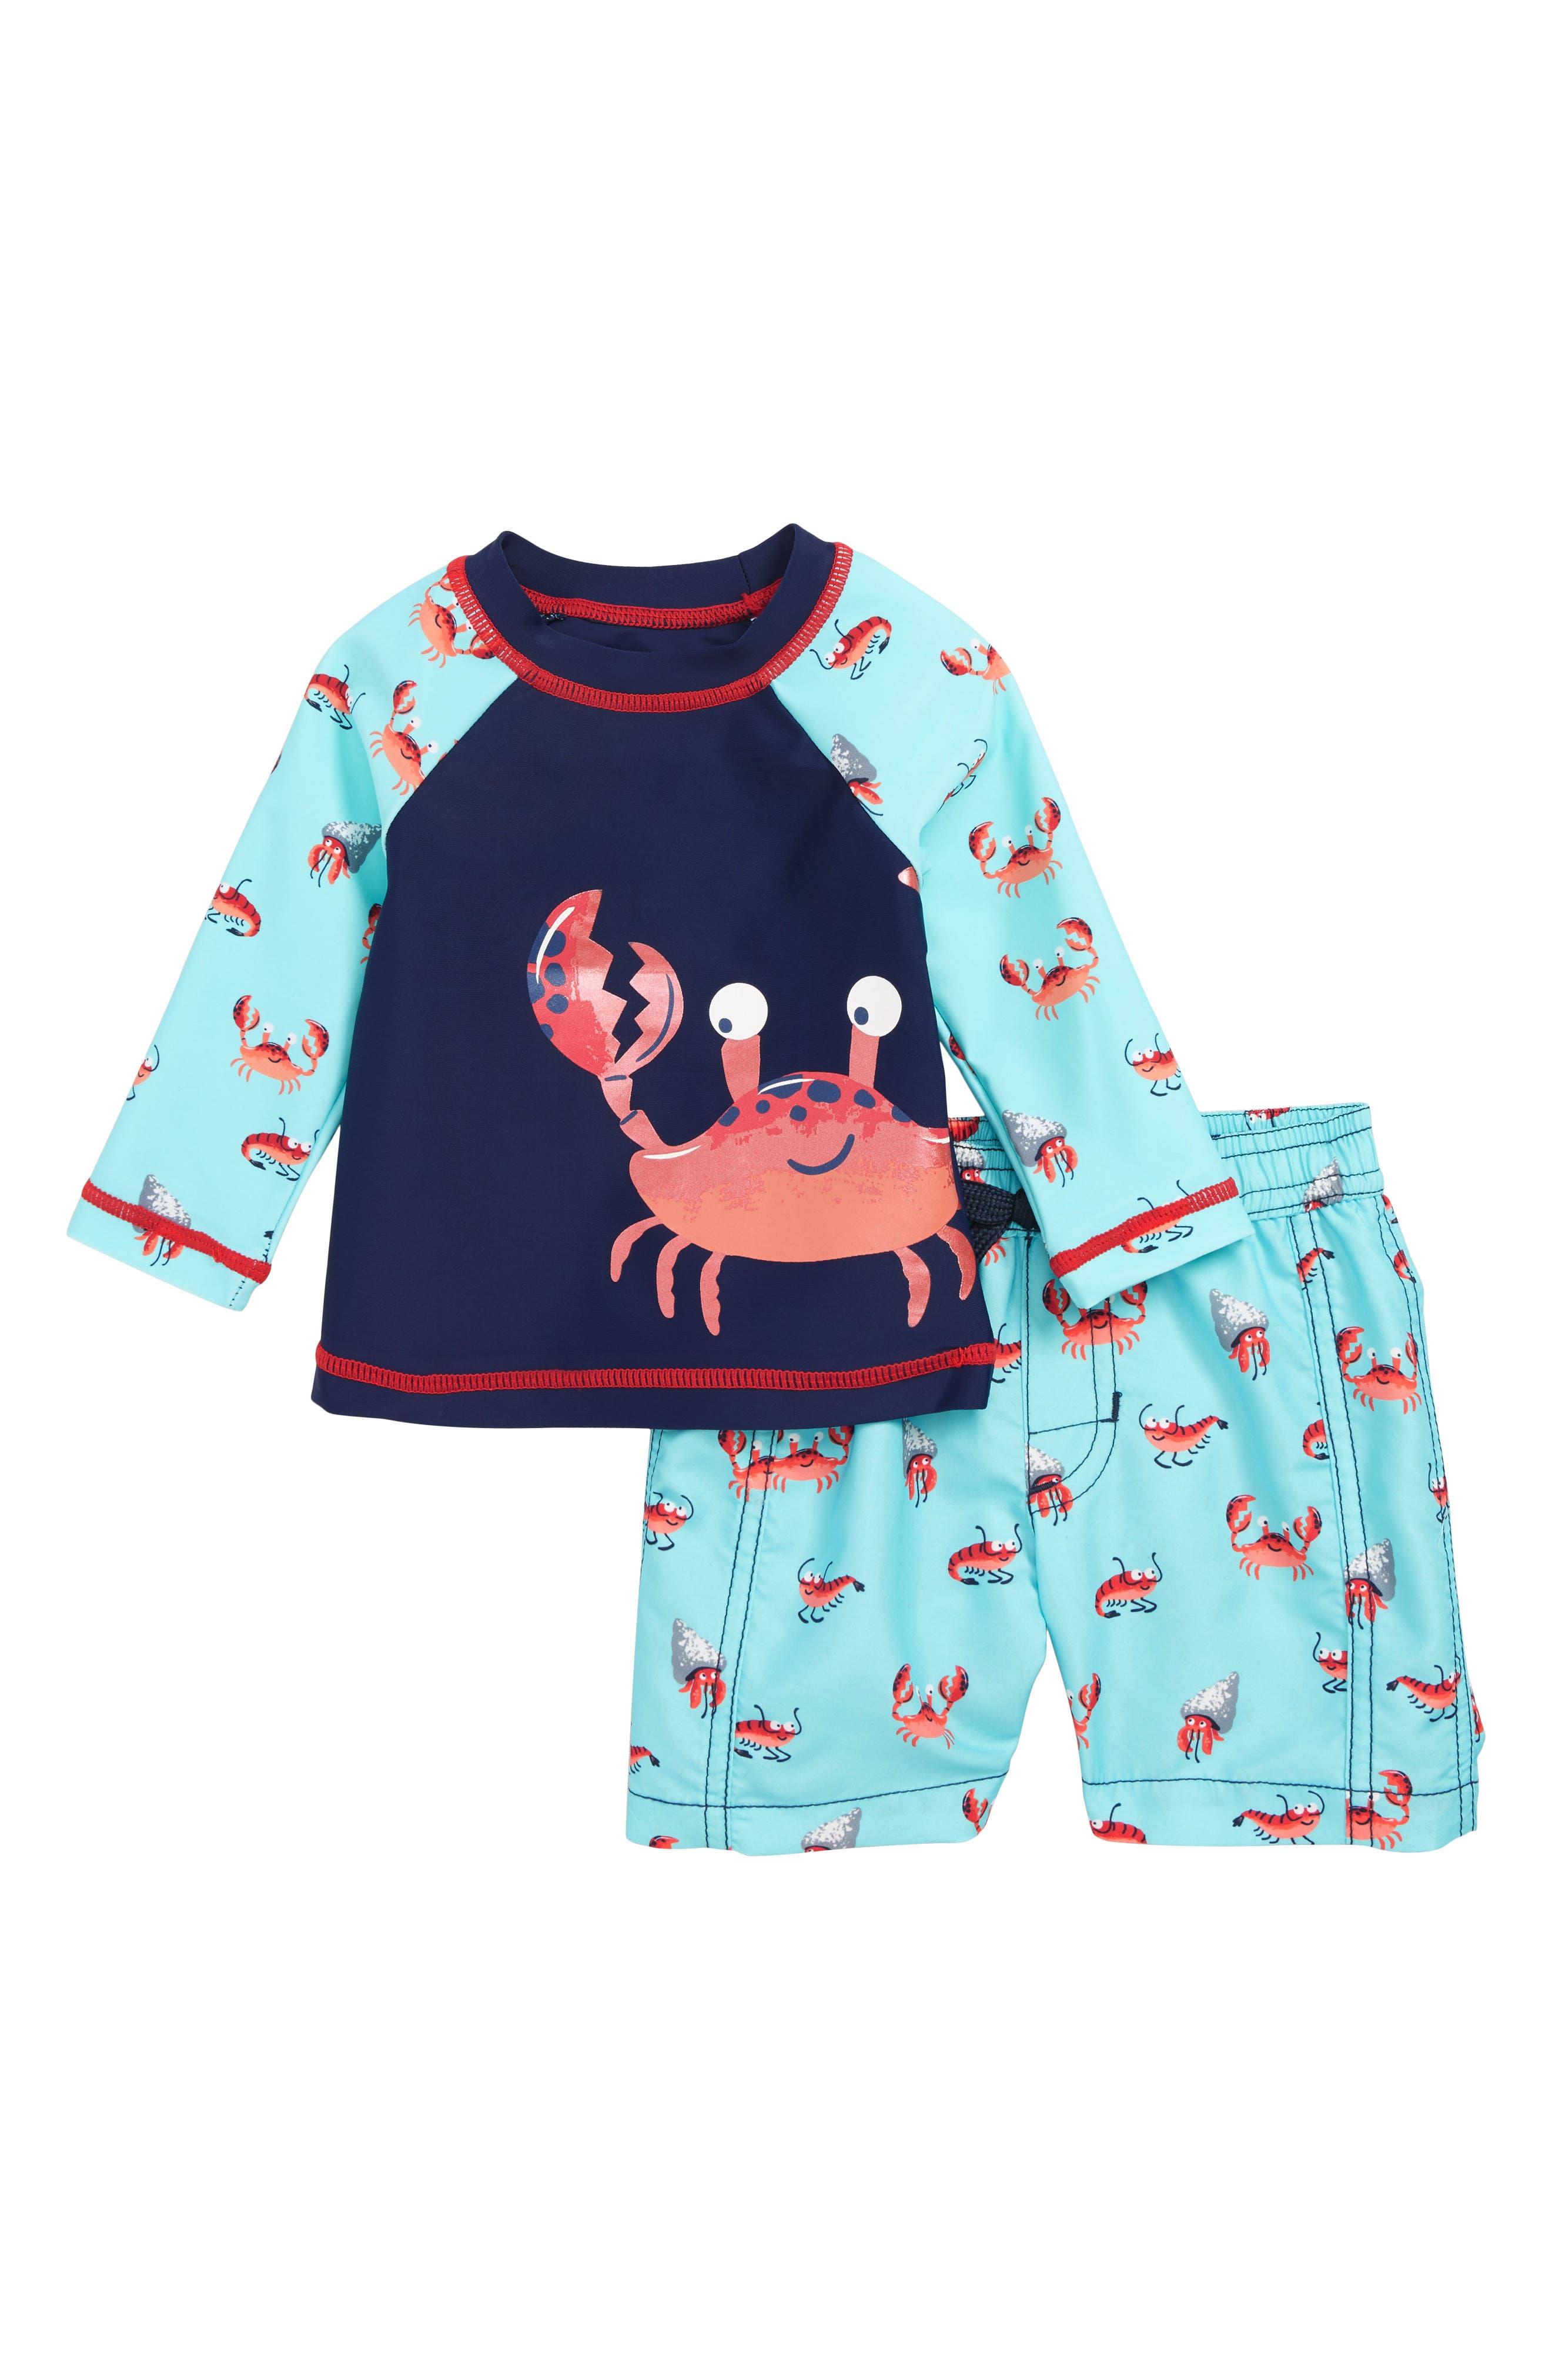 HATLEY, Silly Crustaceans Rashguard & Swim Trunks Set, Main thumbnail 1, color, BLUE